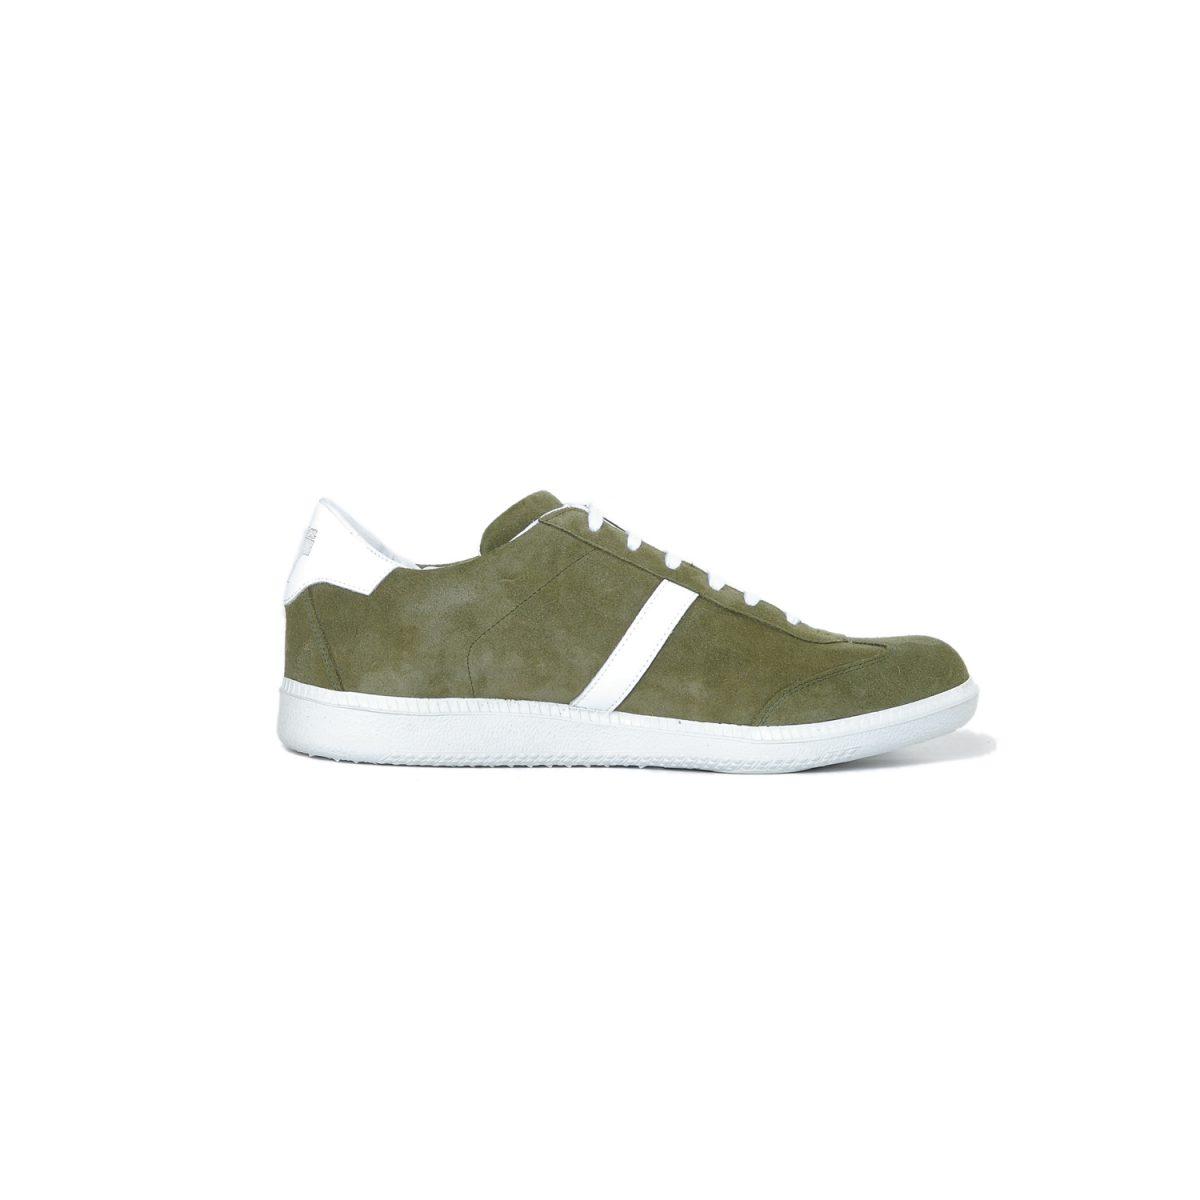 Tisza shoes - Comfort - Khaki-white